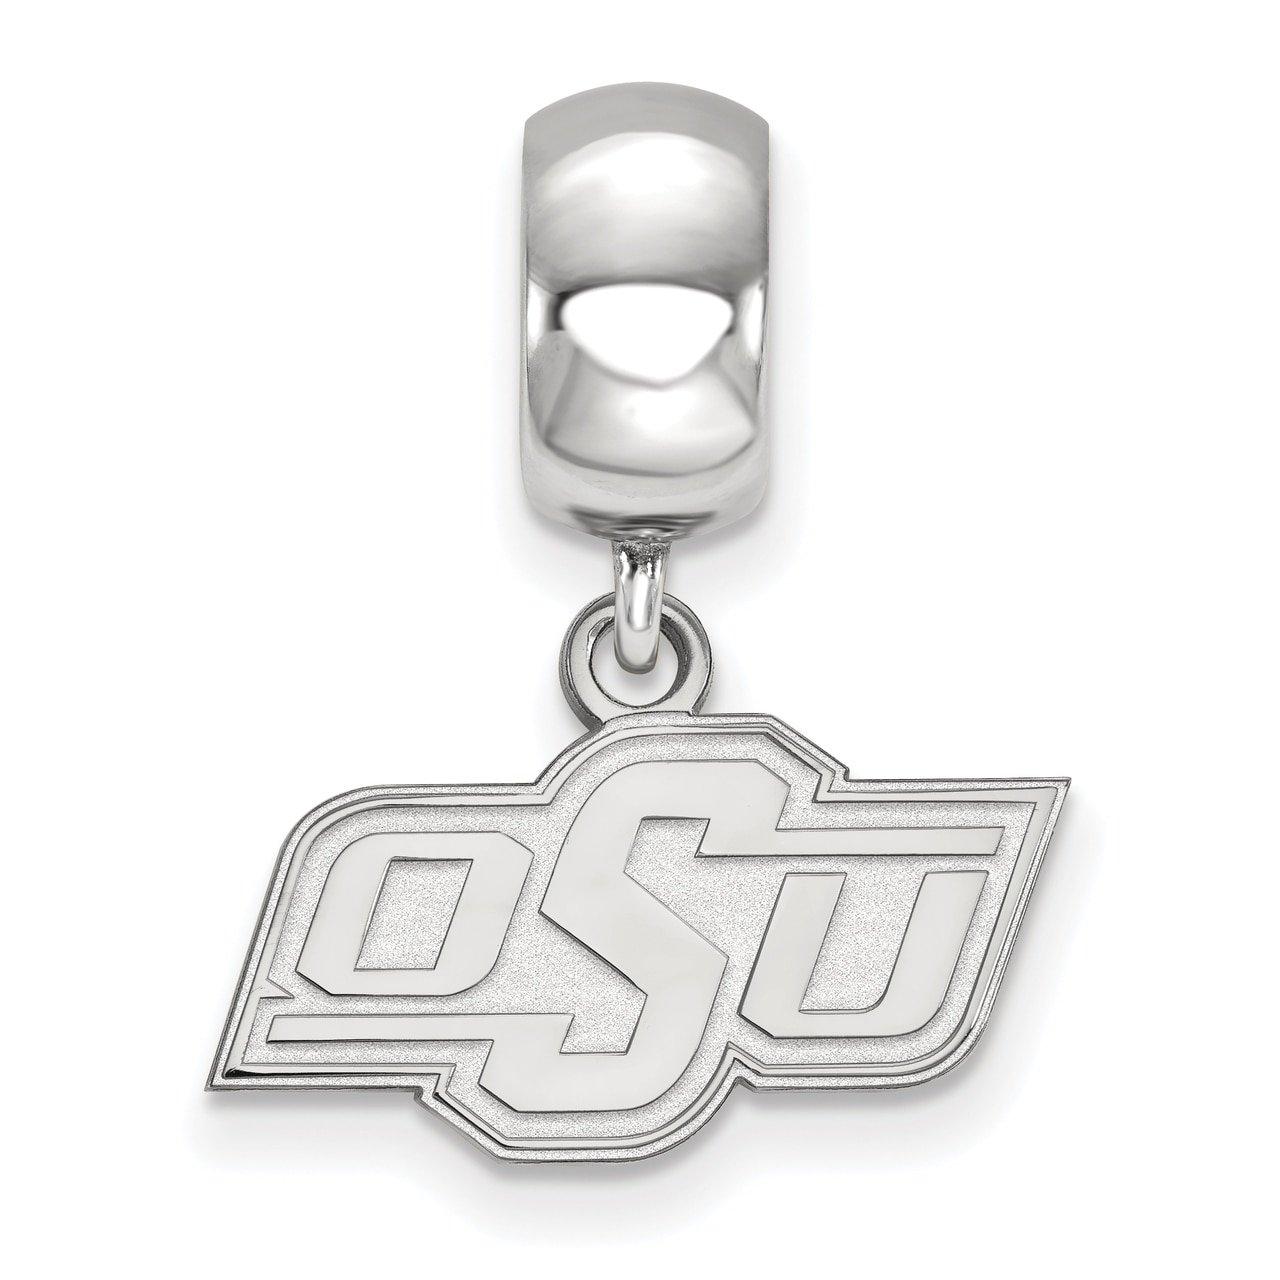 Lex /& Lu LogoArt Gold Plated Sterling Silver The University of Oklahoma Bead Charm XS Dangle